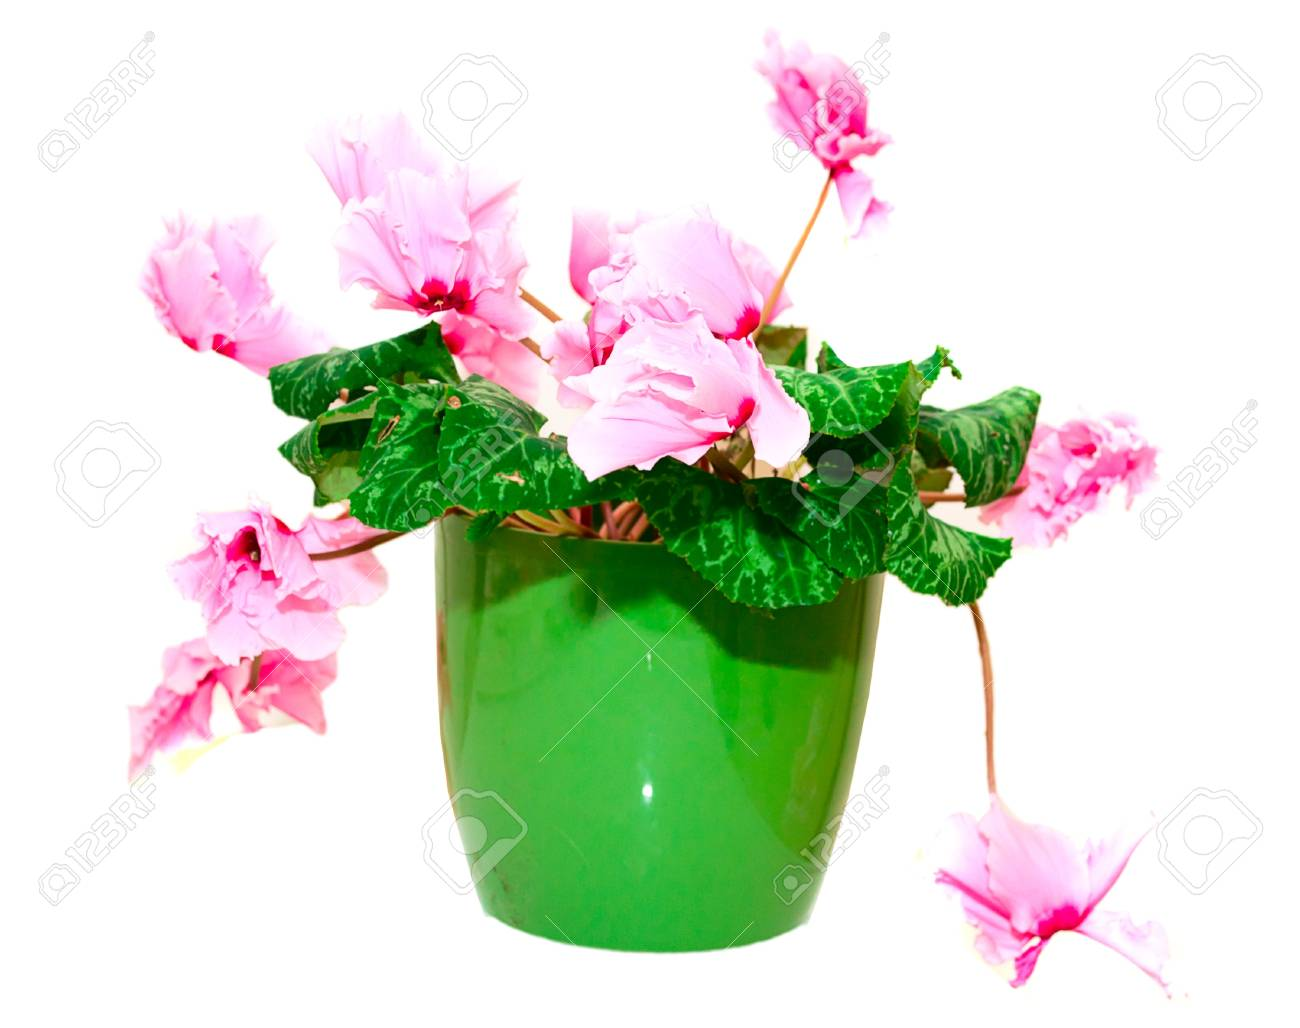 Pink cyclamen in a green pot Stock Photo - 17707652